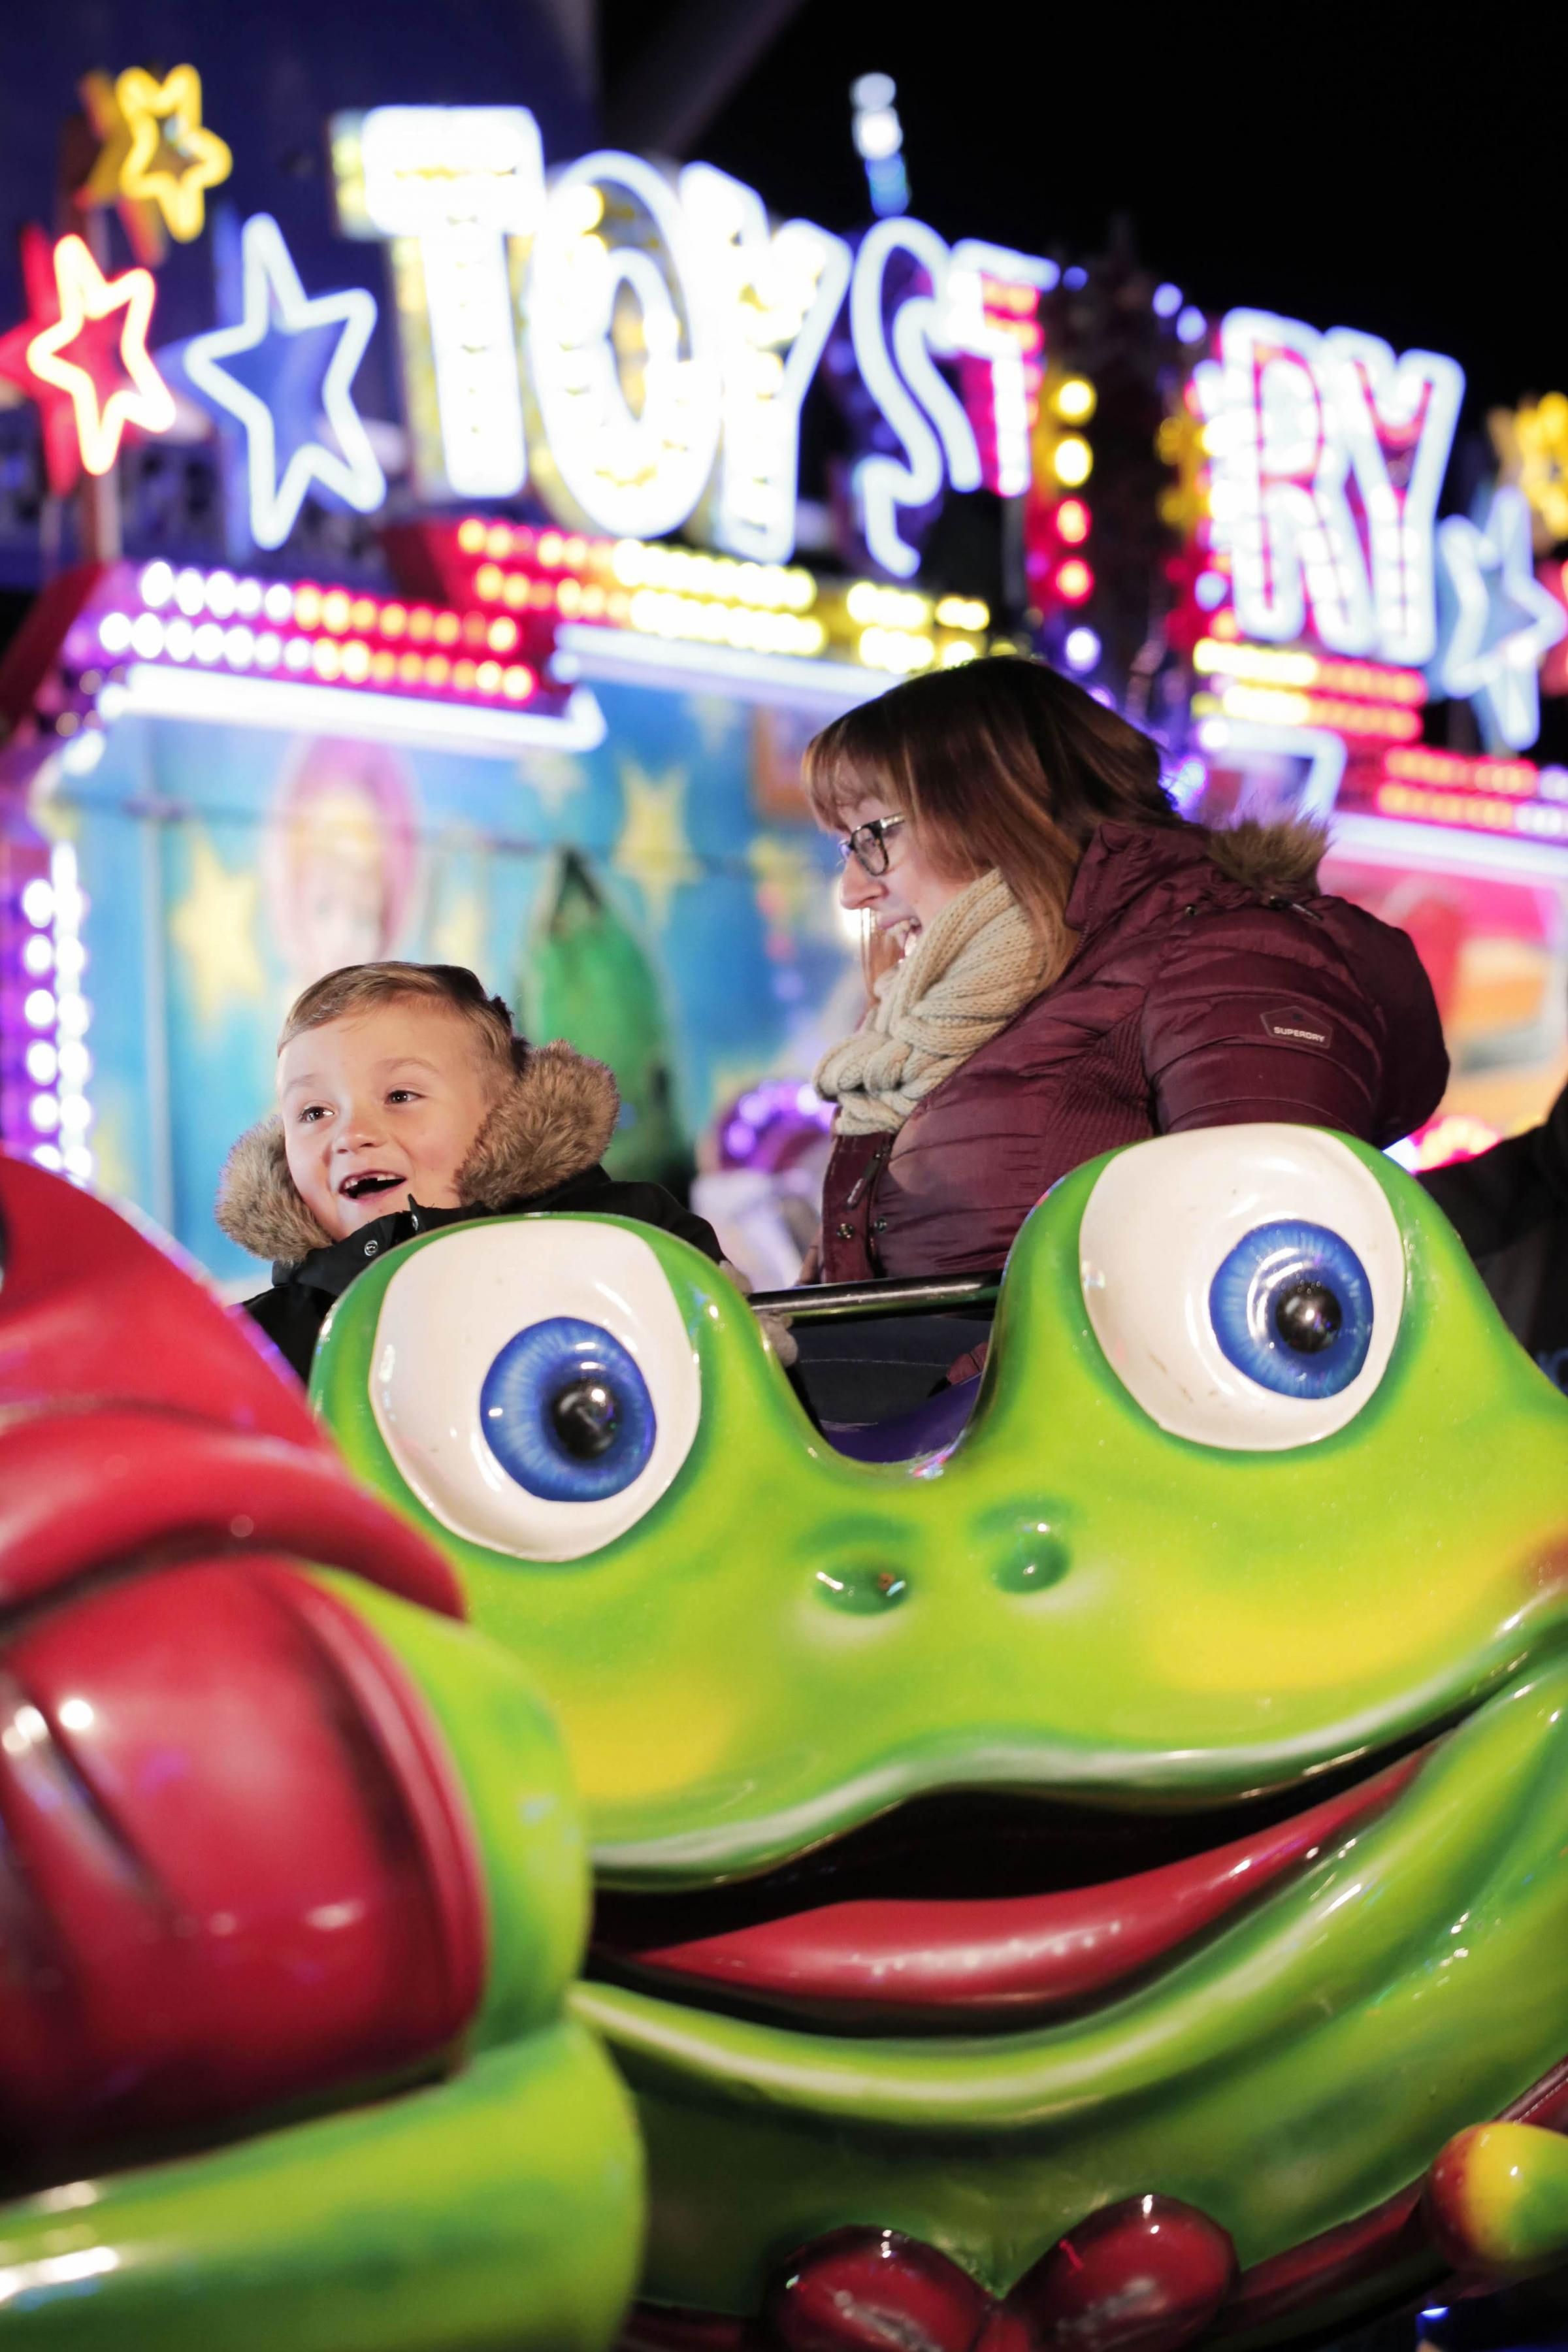 Pictures: Darlington Arena fireworks and funfair